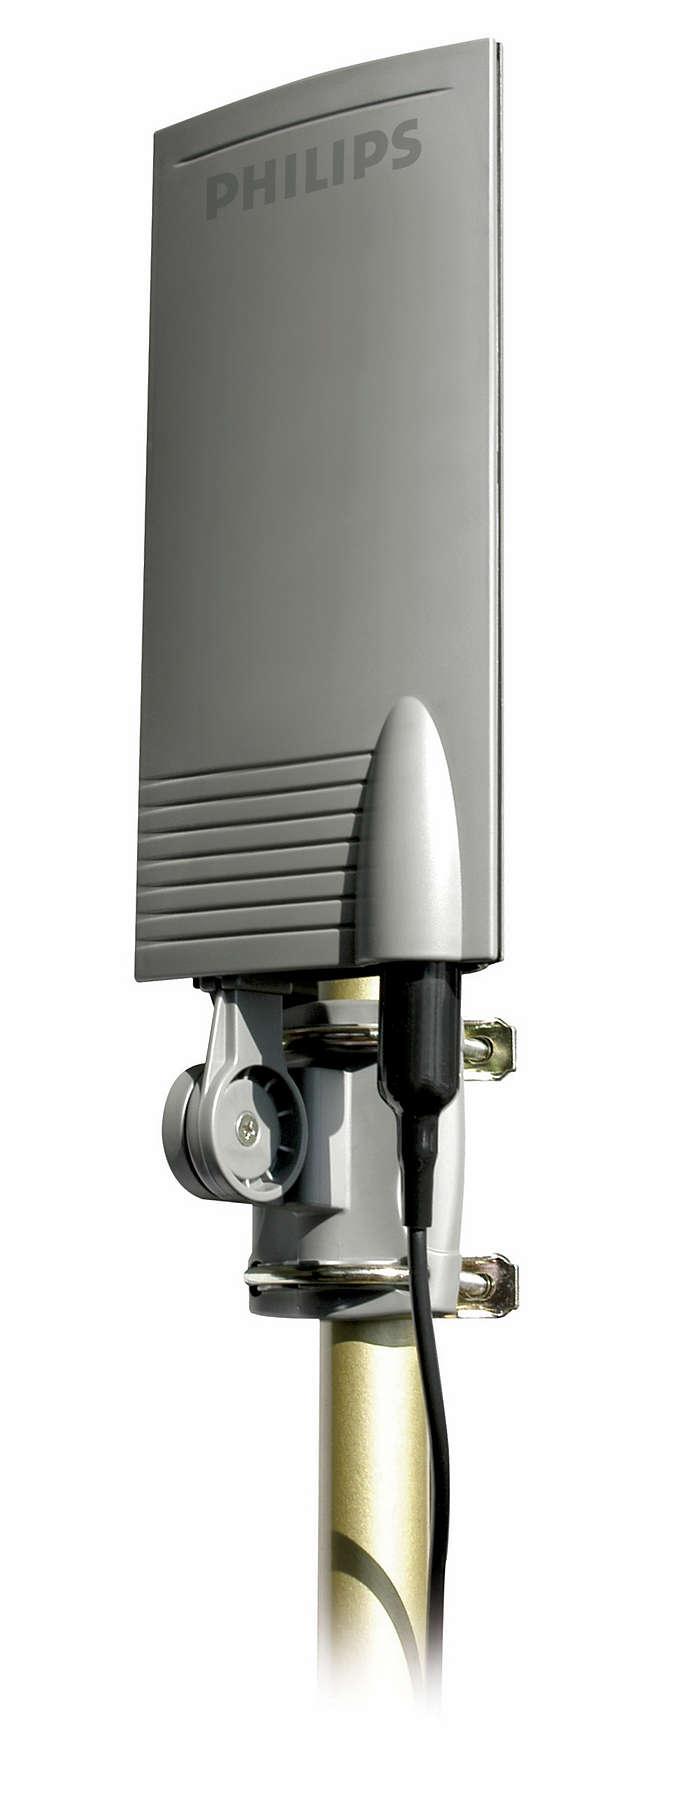 Receive digital and analog TV